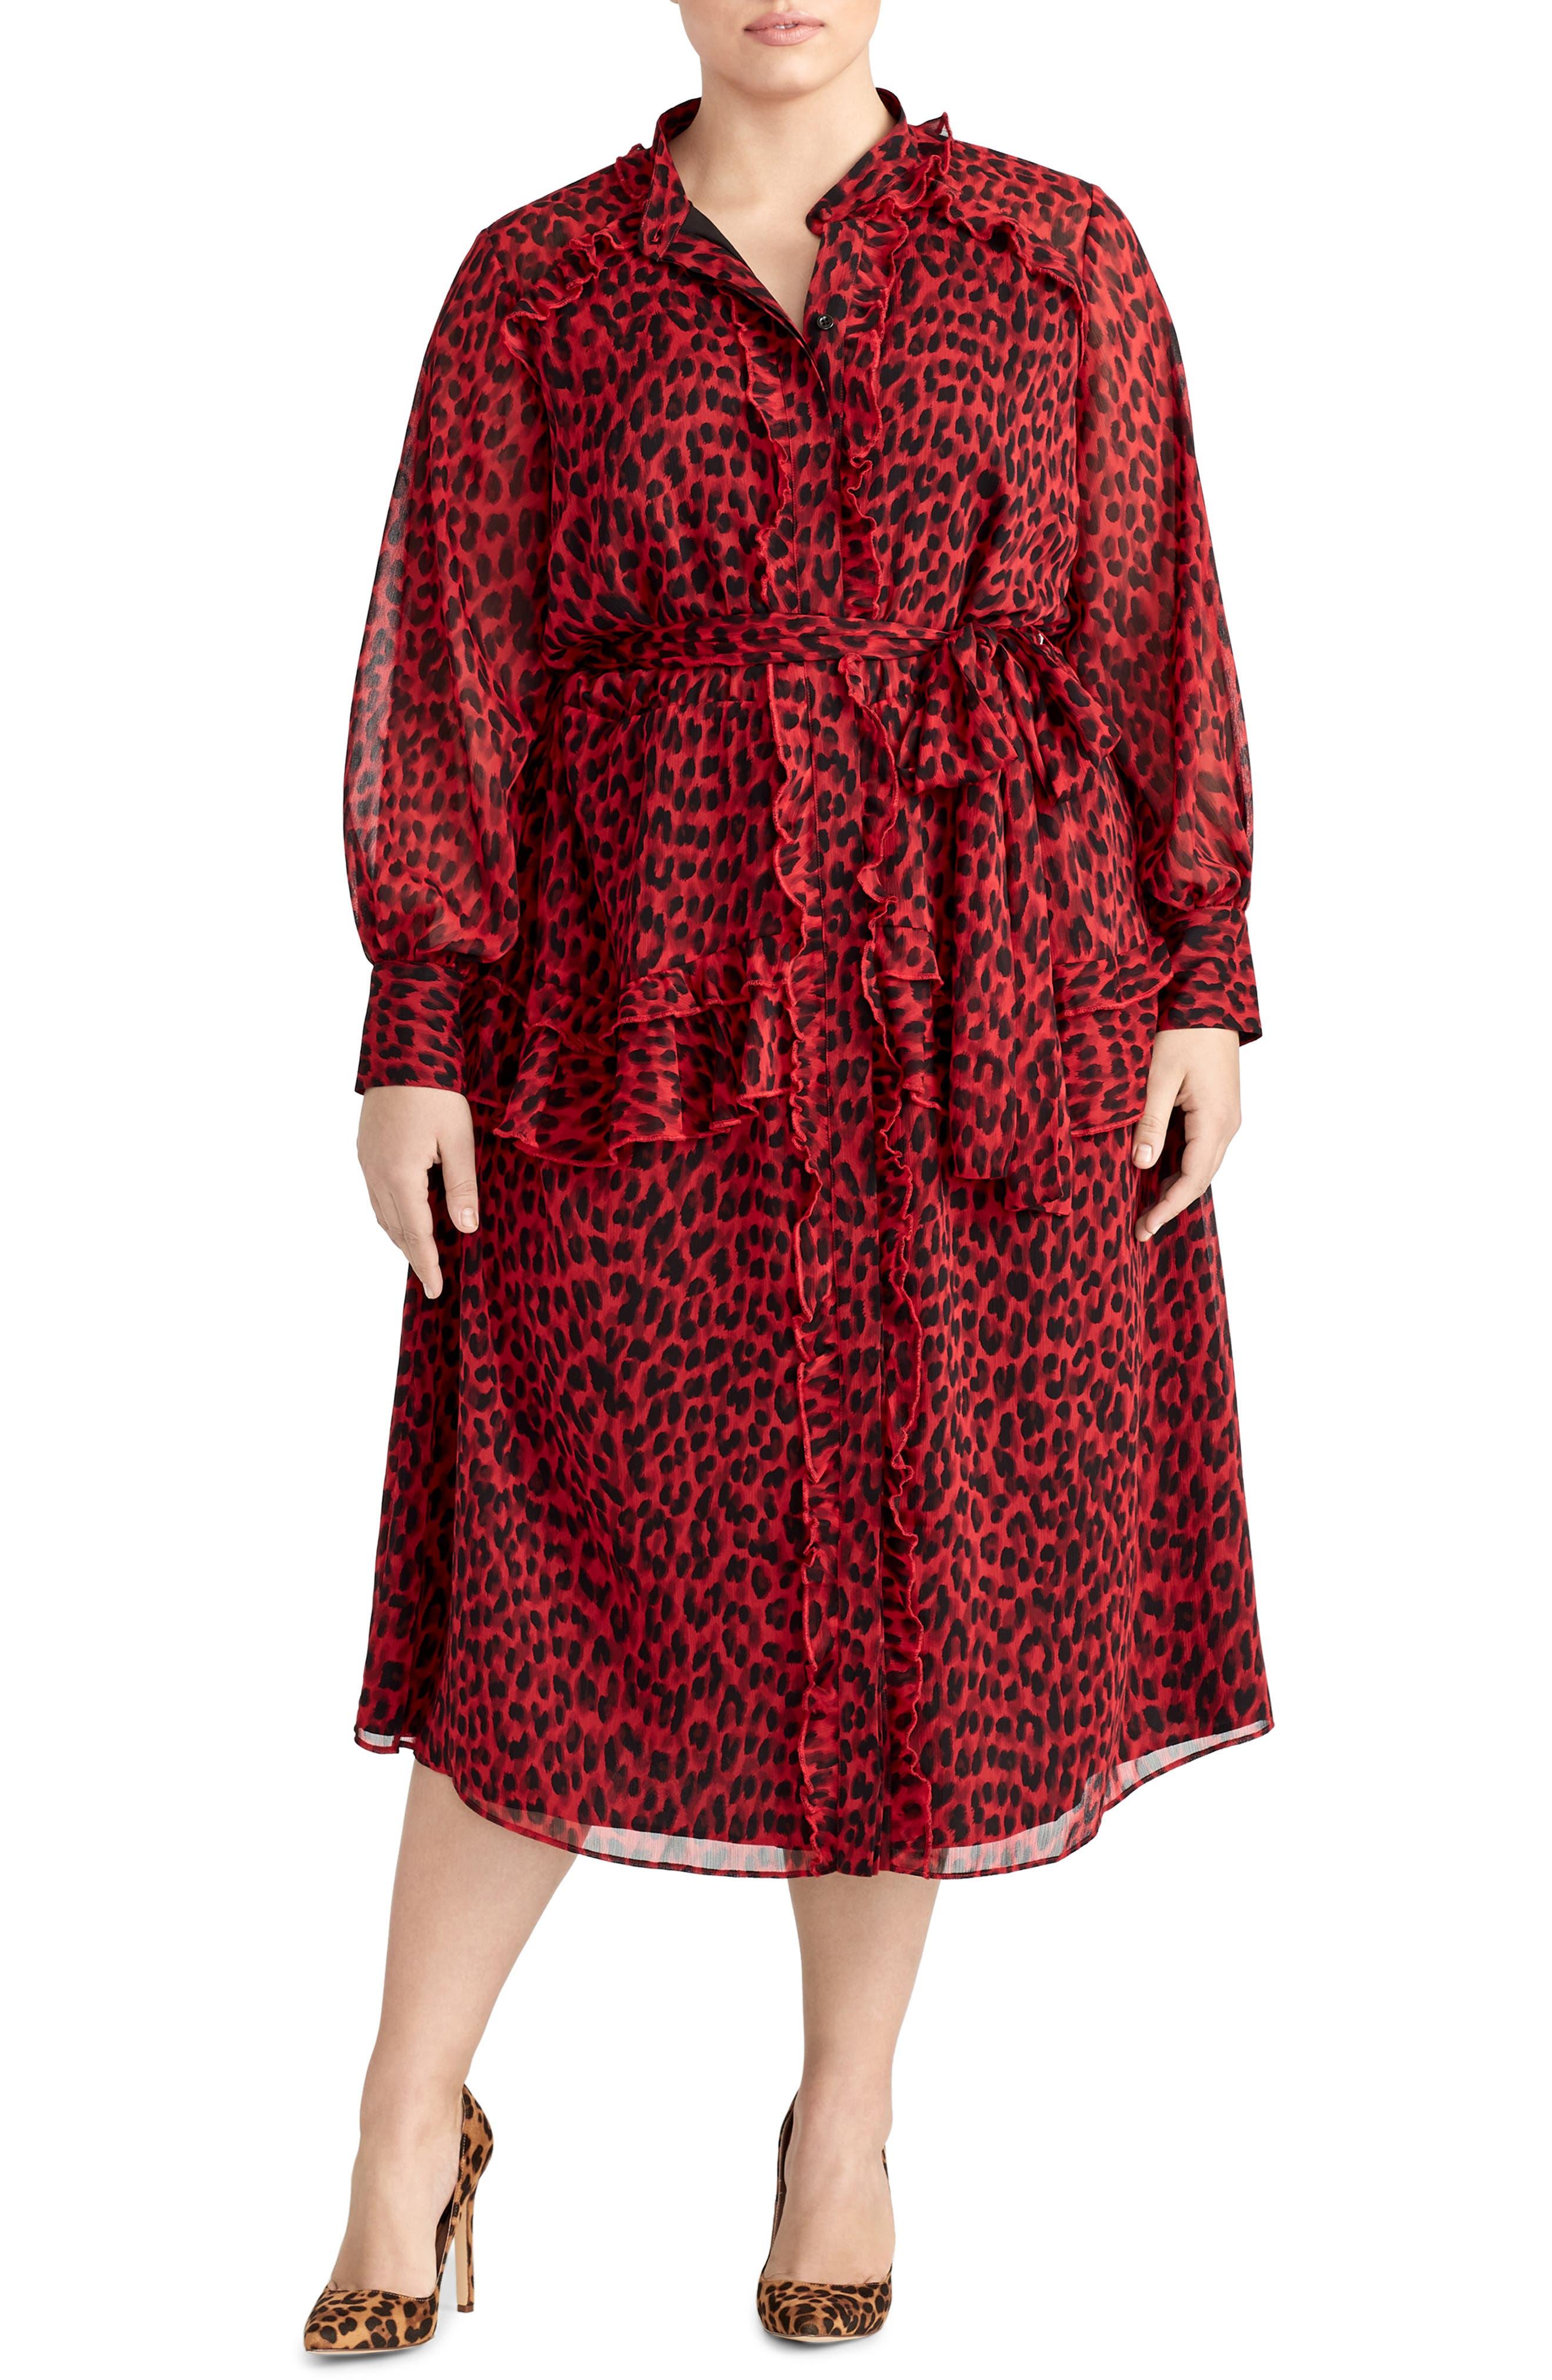 Plus Size Rachel Roy Collection Leopard Ruffle Dress, Red